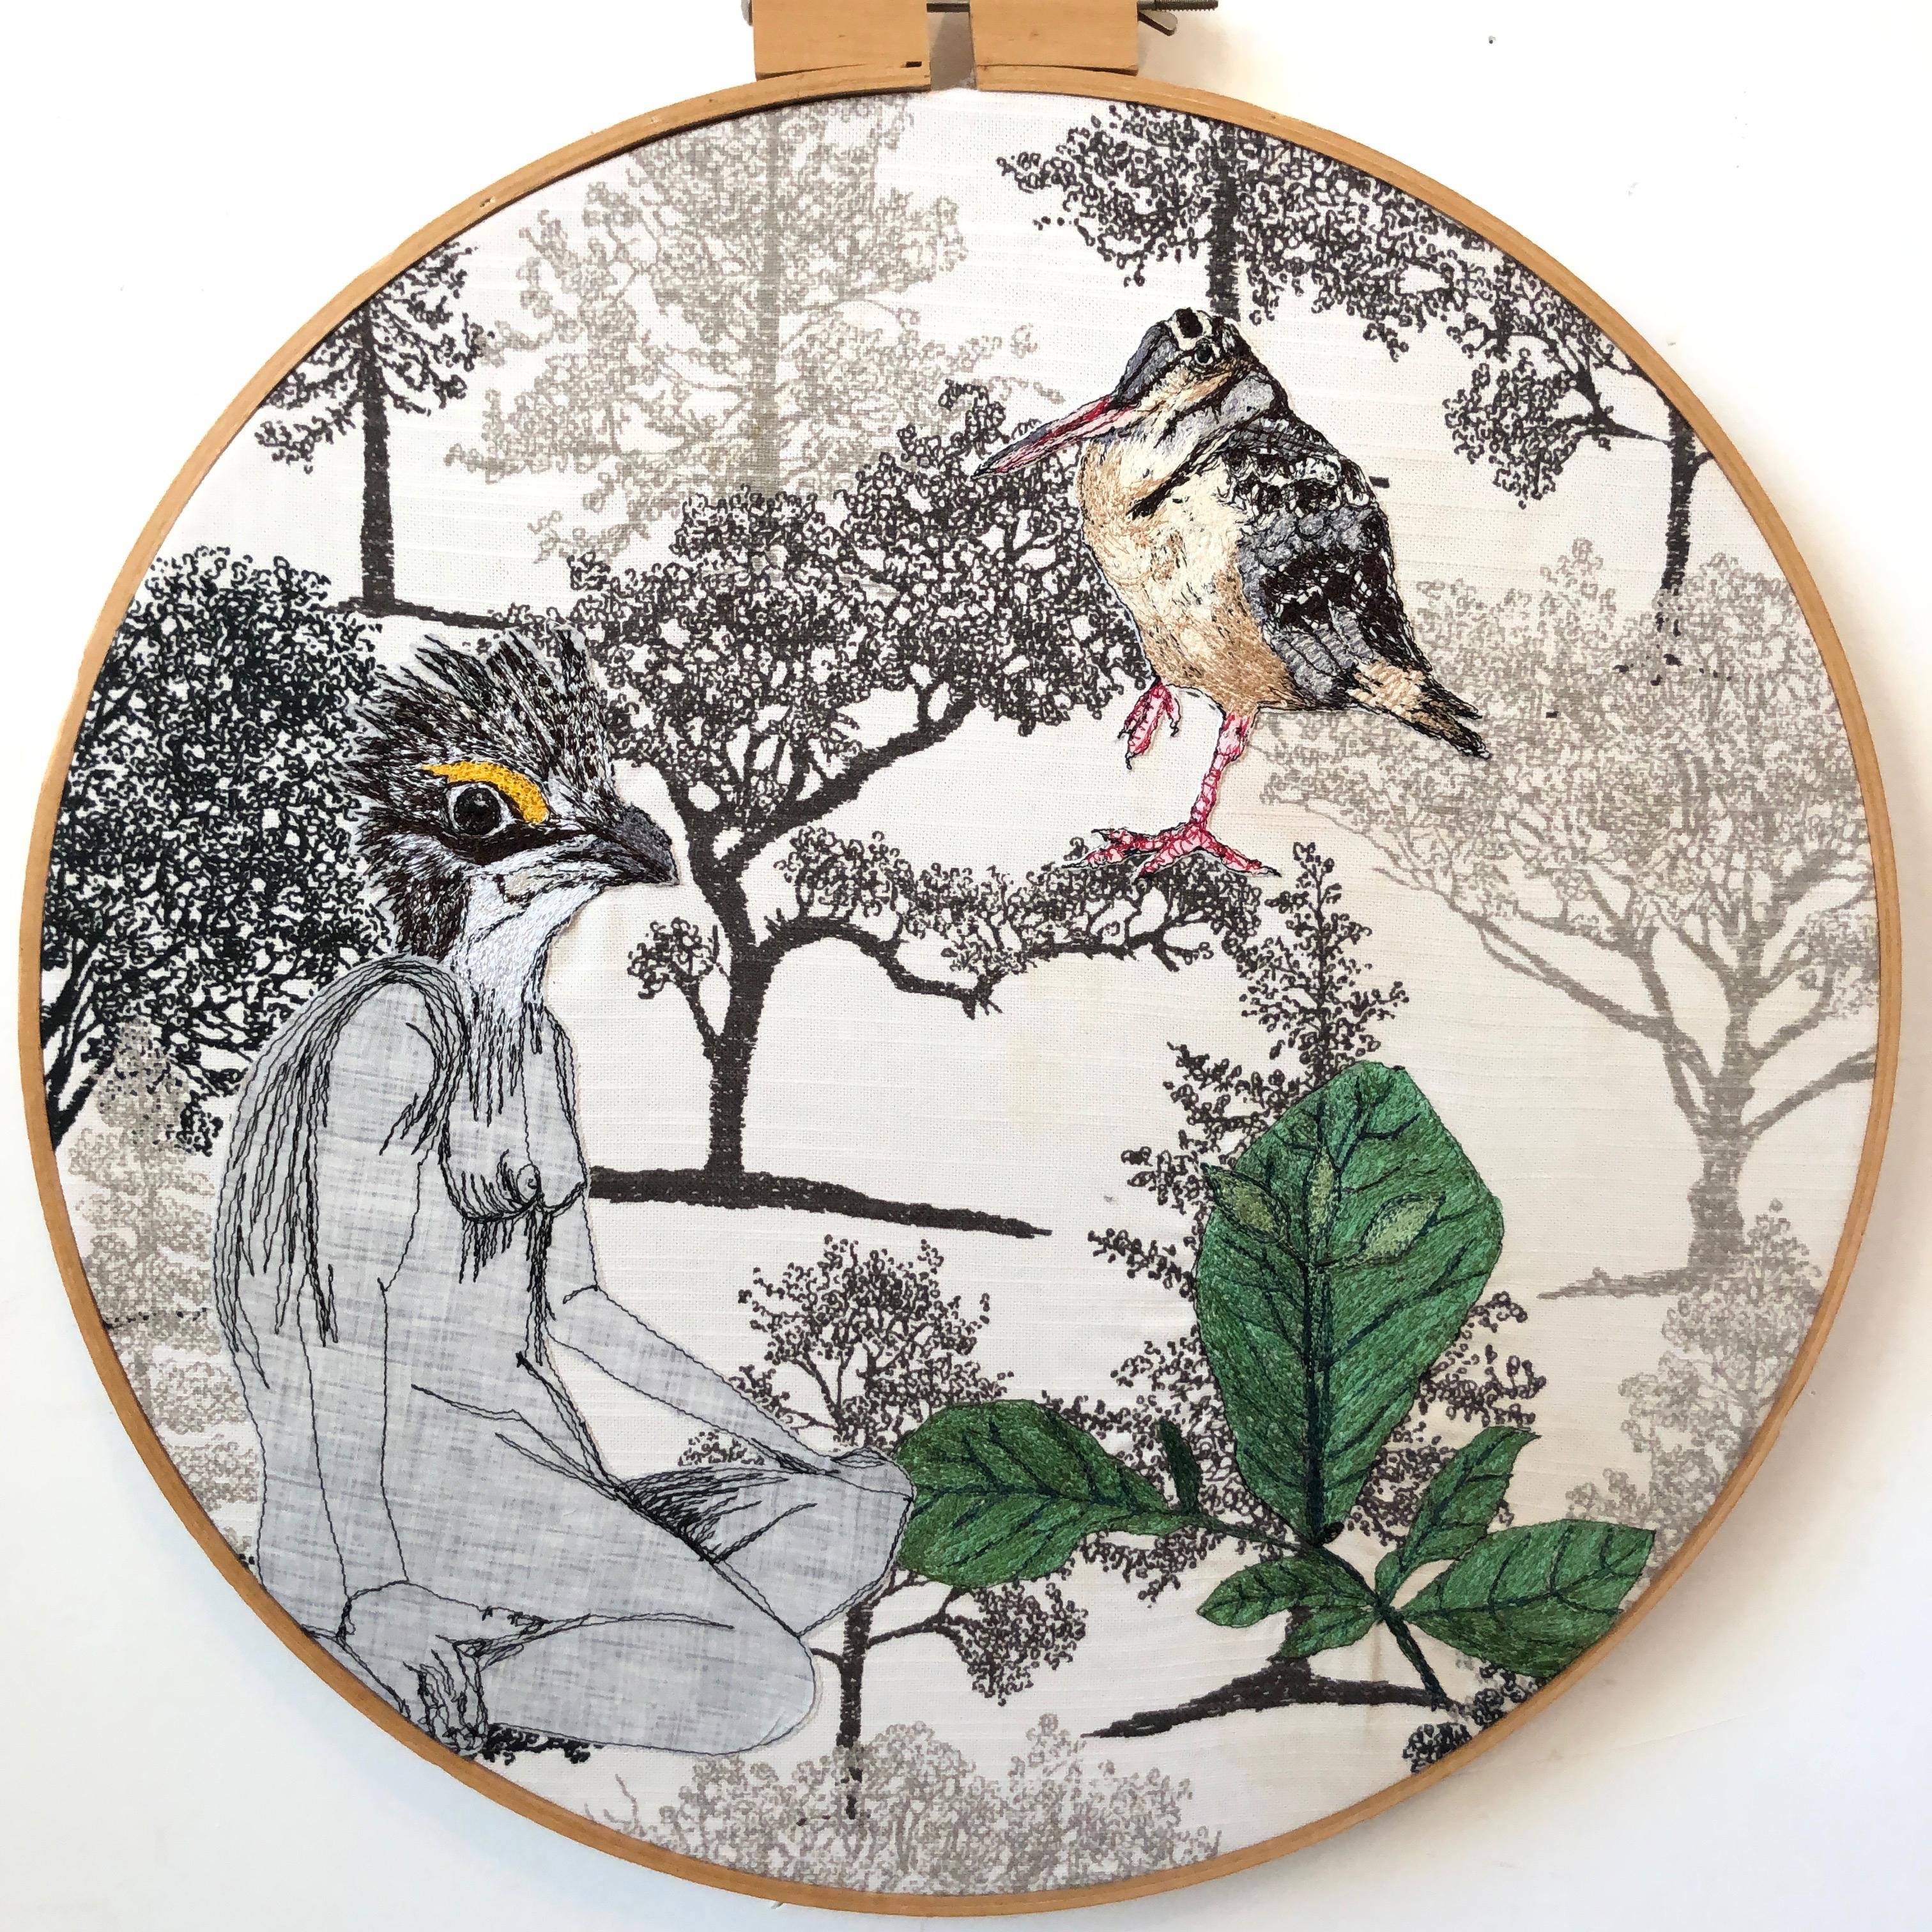 fiberart, thread drawing, figure, bird headed women, woodcock. birds